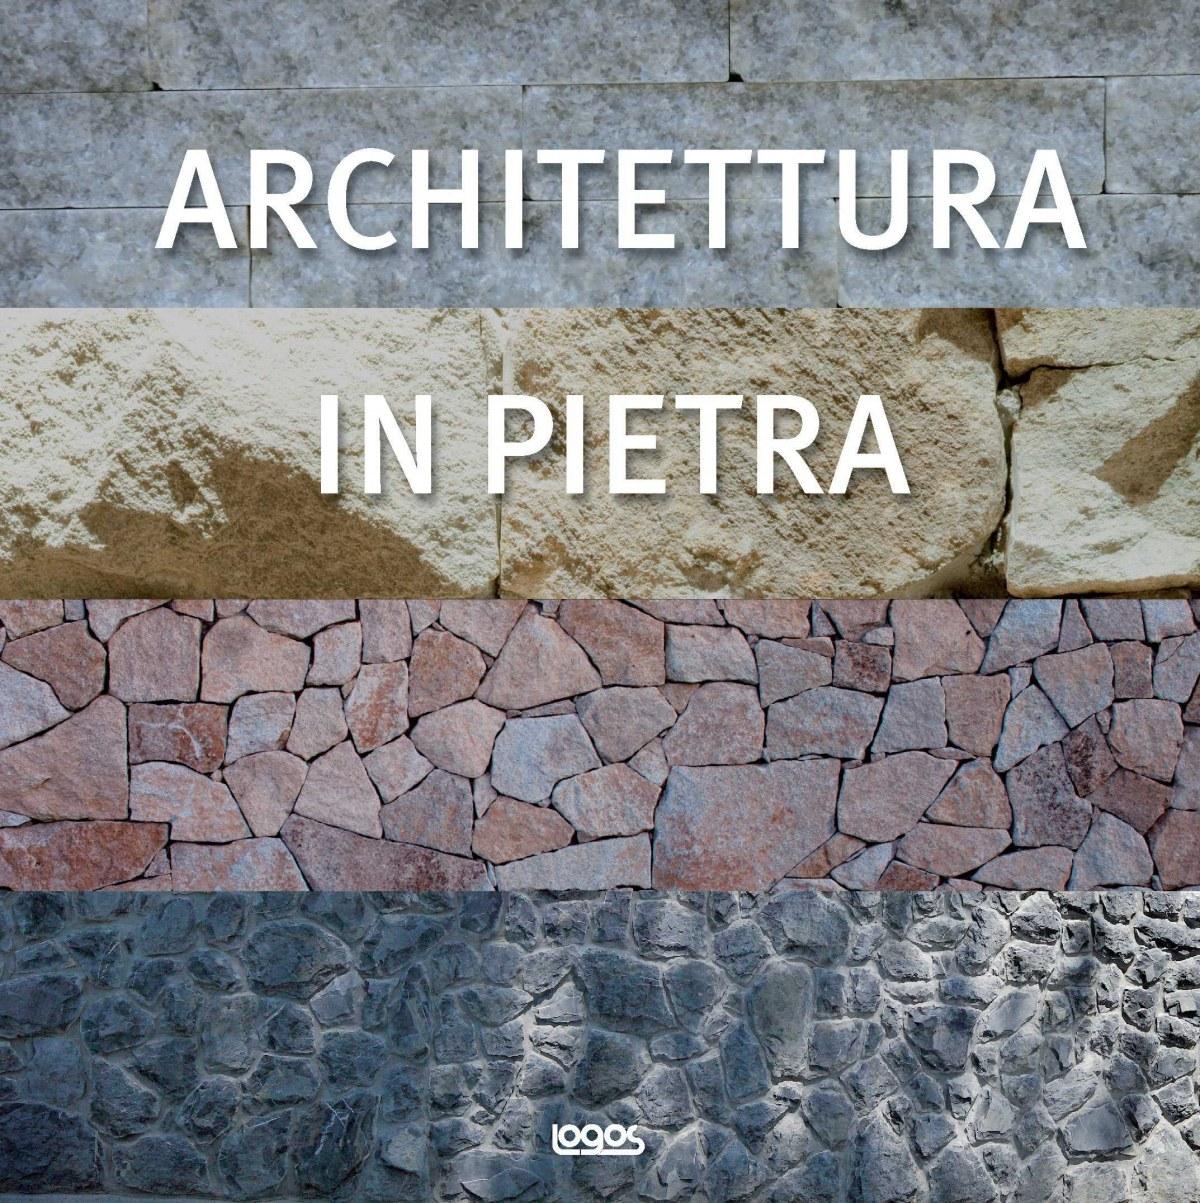 ARCHITETTURA IN PIETRA 9788857604893